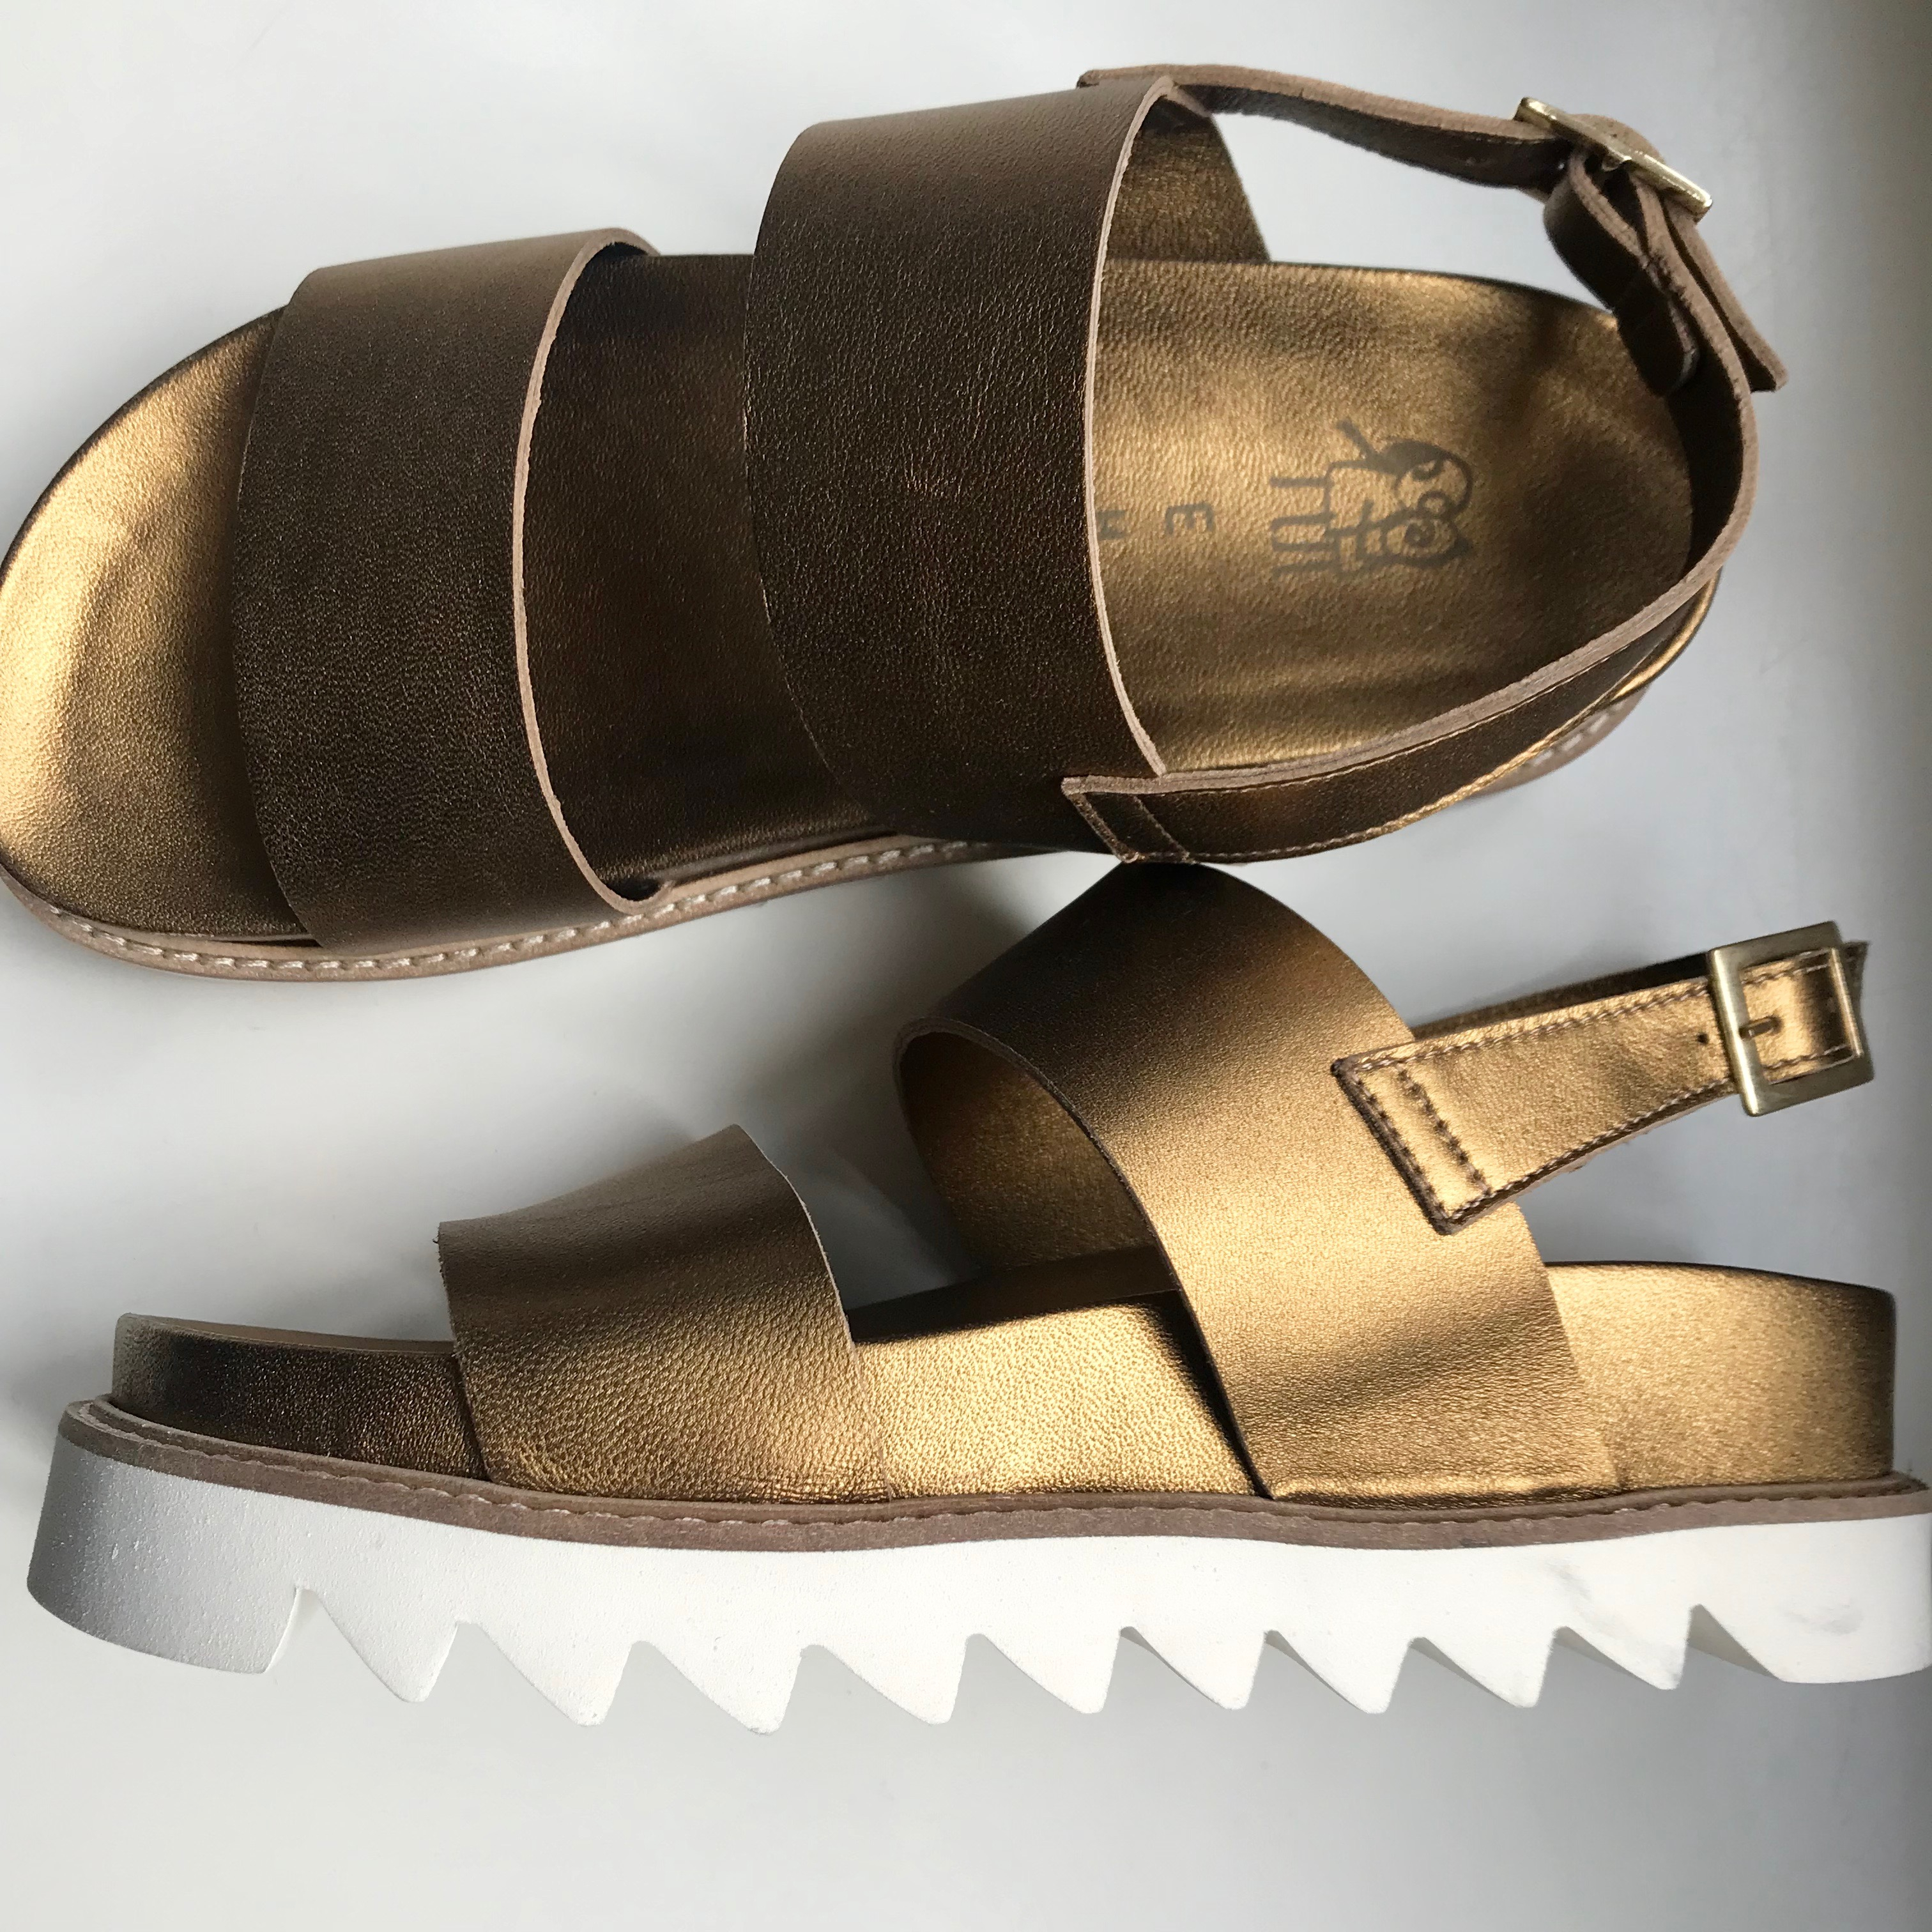 EHM Gritt Metallic Sandal, Bronzo